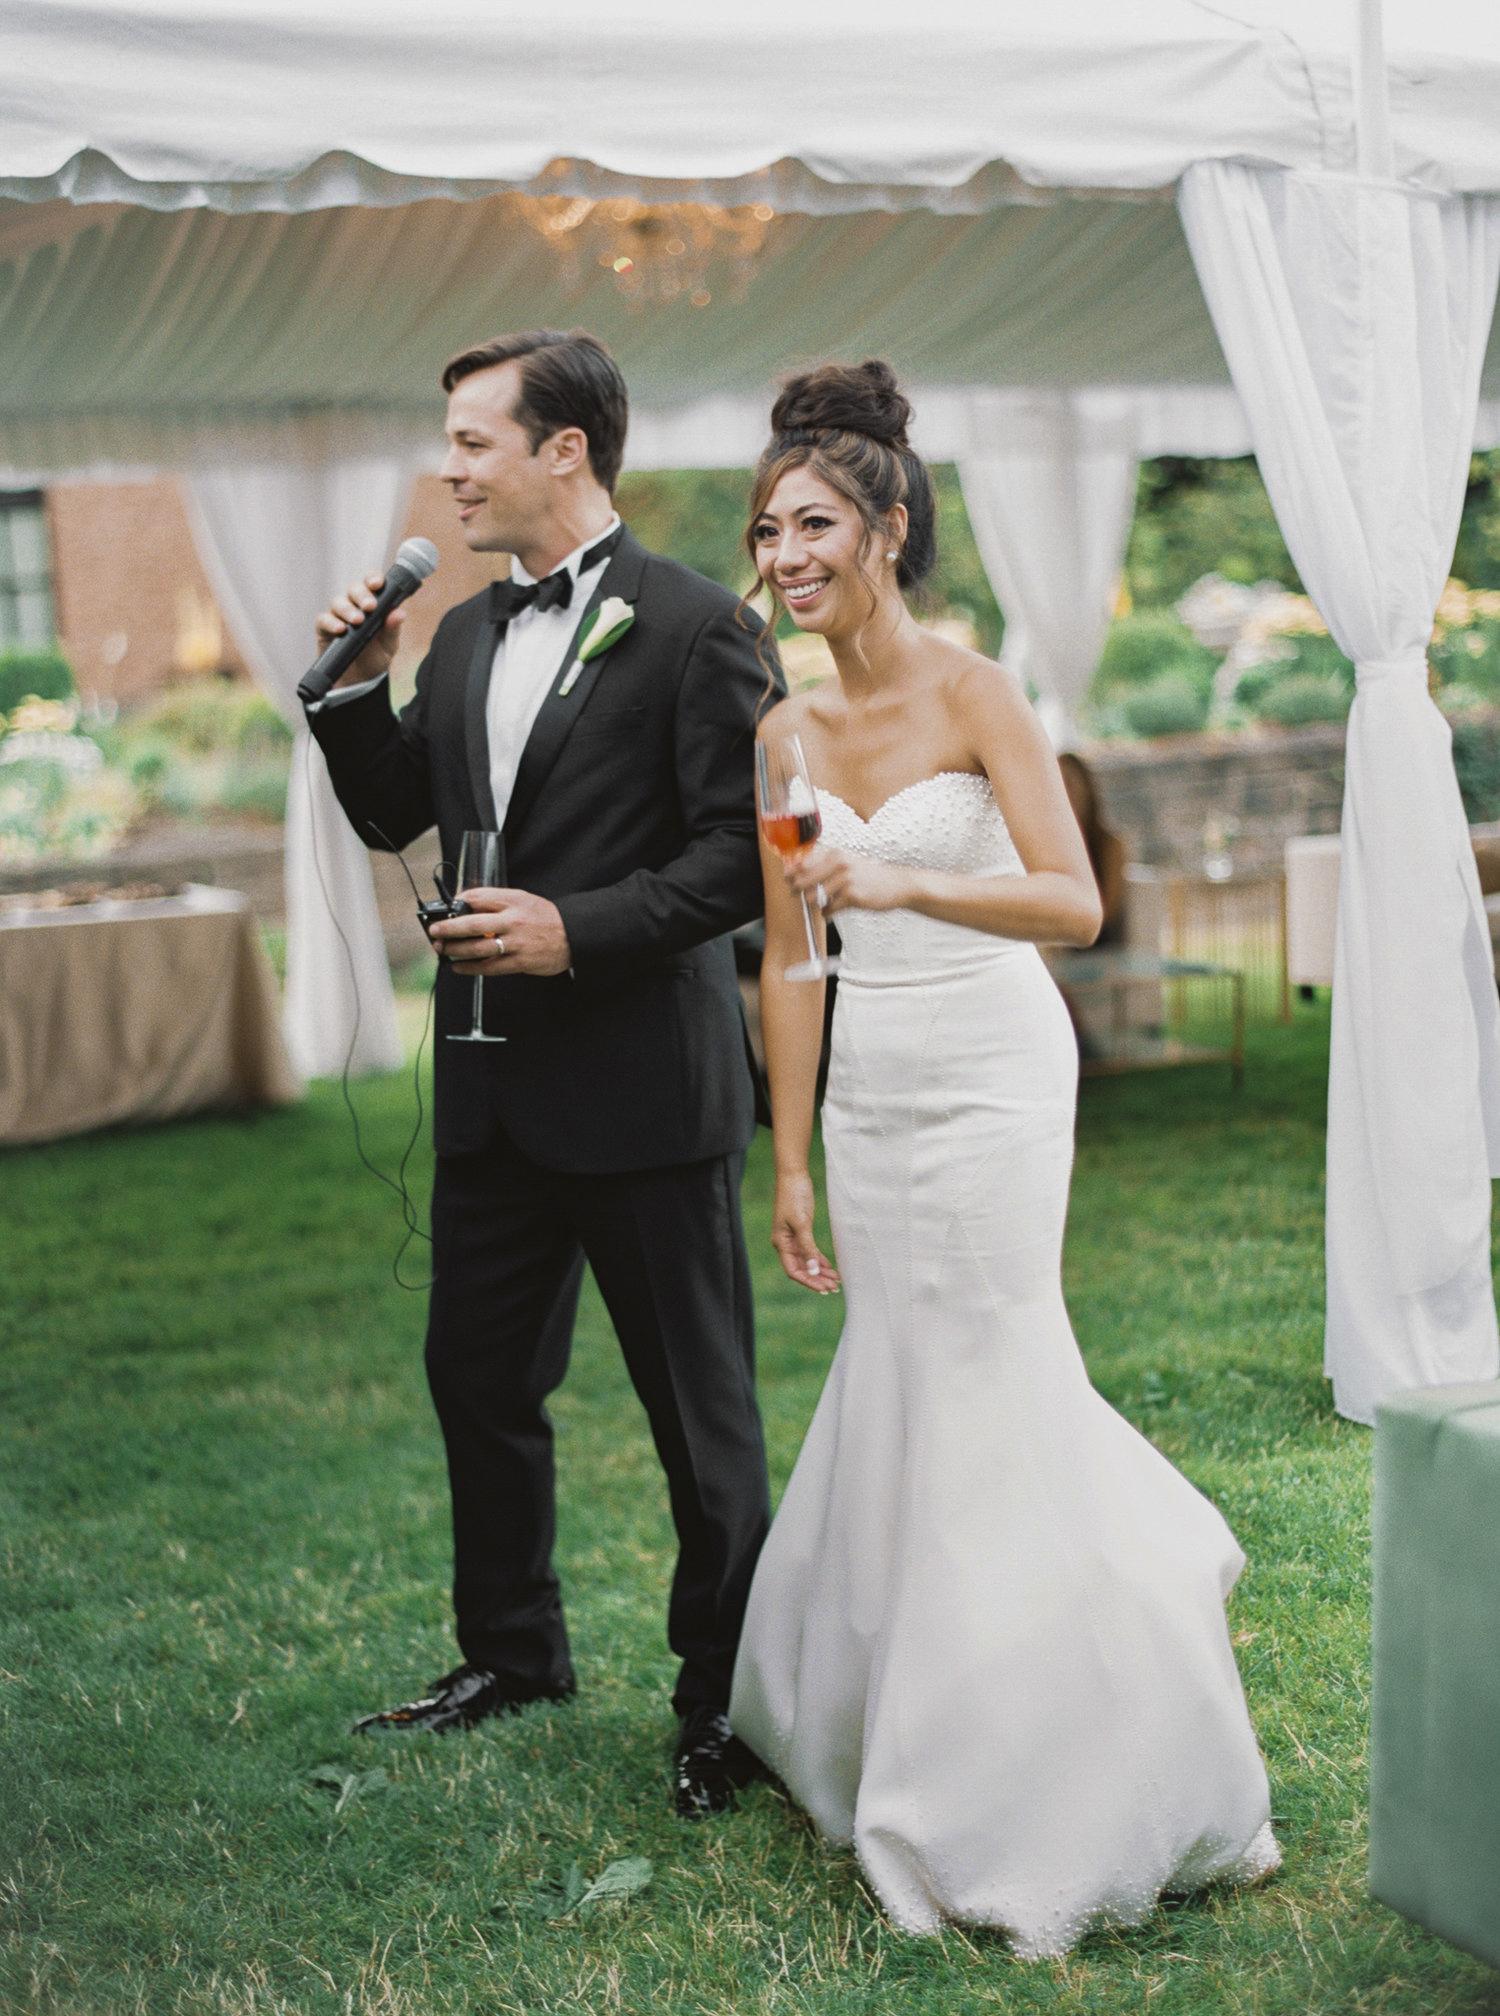 207OutliveCreative_Travel_Photographer_Videographer_Lewis&Clark_Oregon_Elegant_BlackTie_Destination_Wedding.jpg